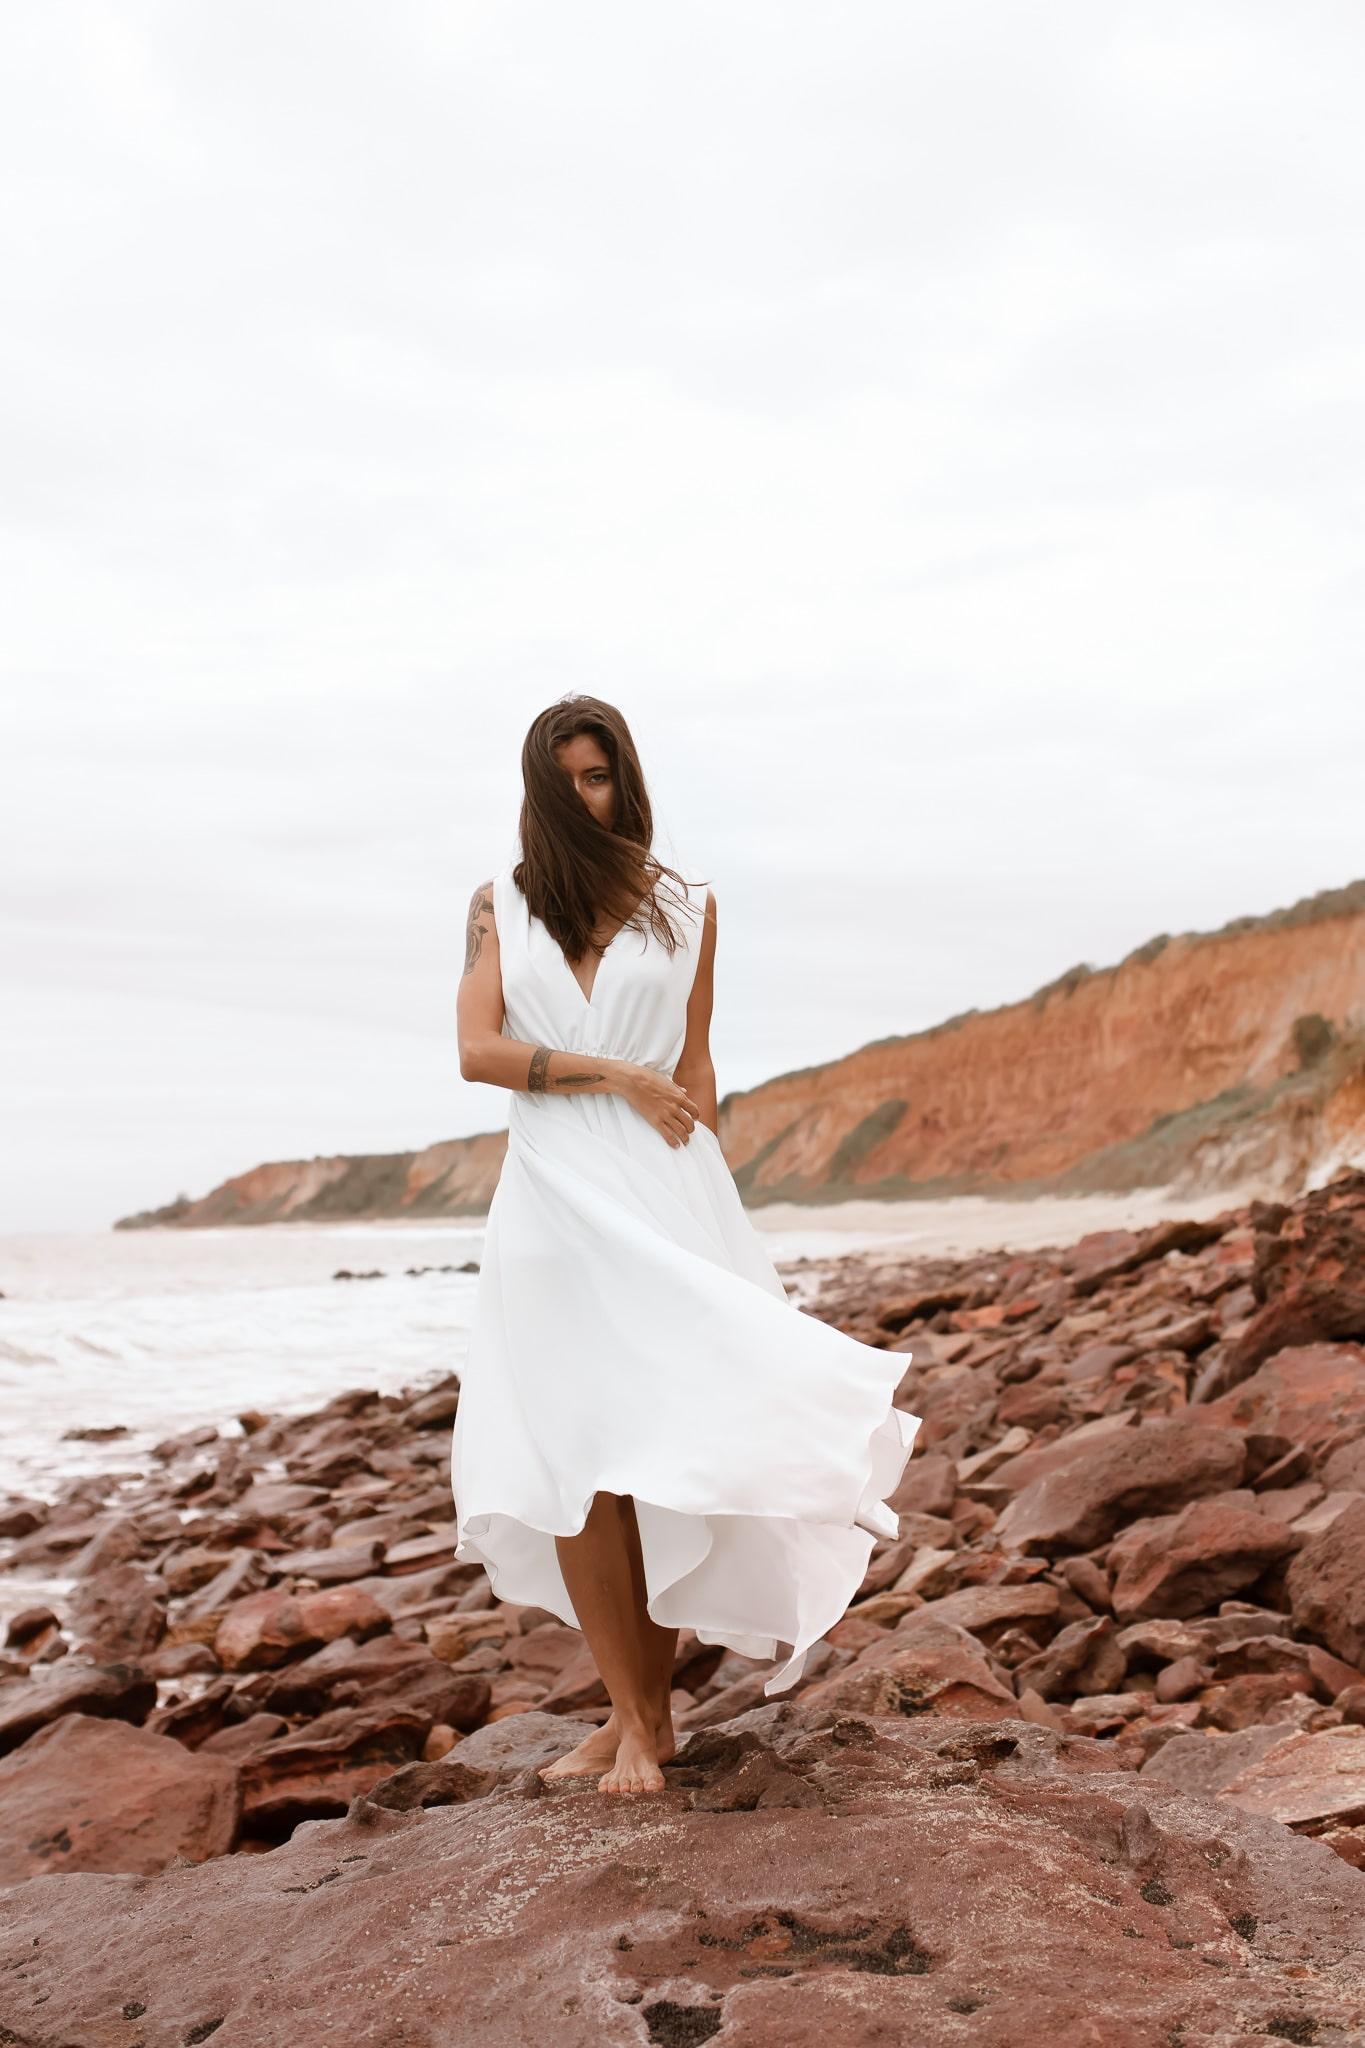 Vestido decotado branco